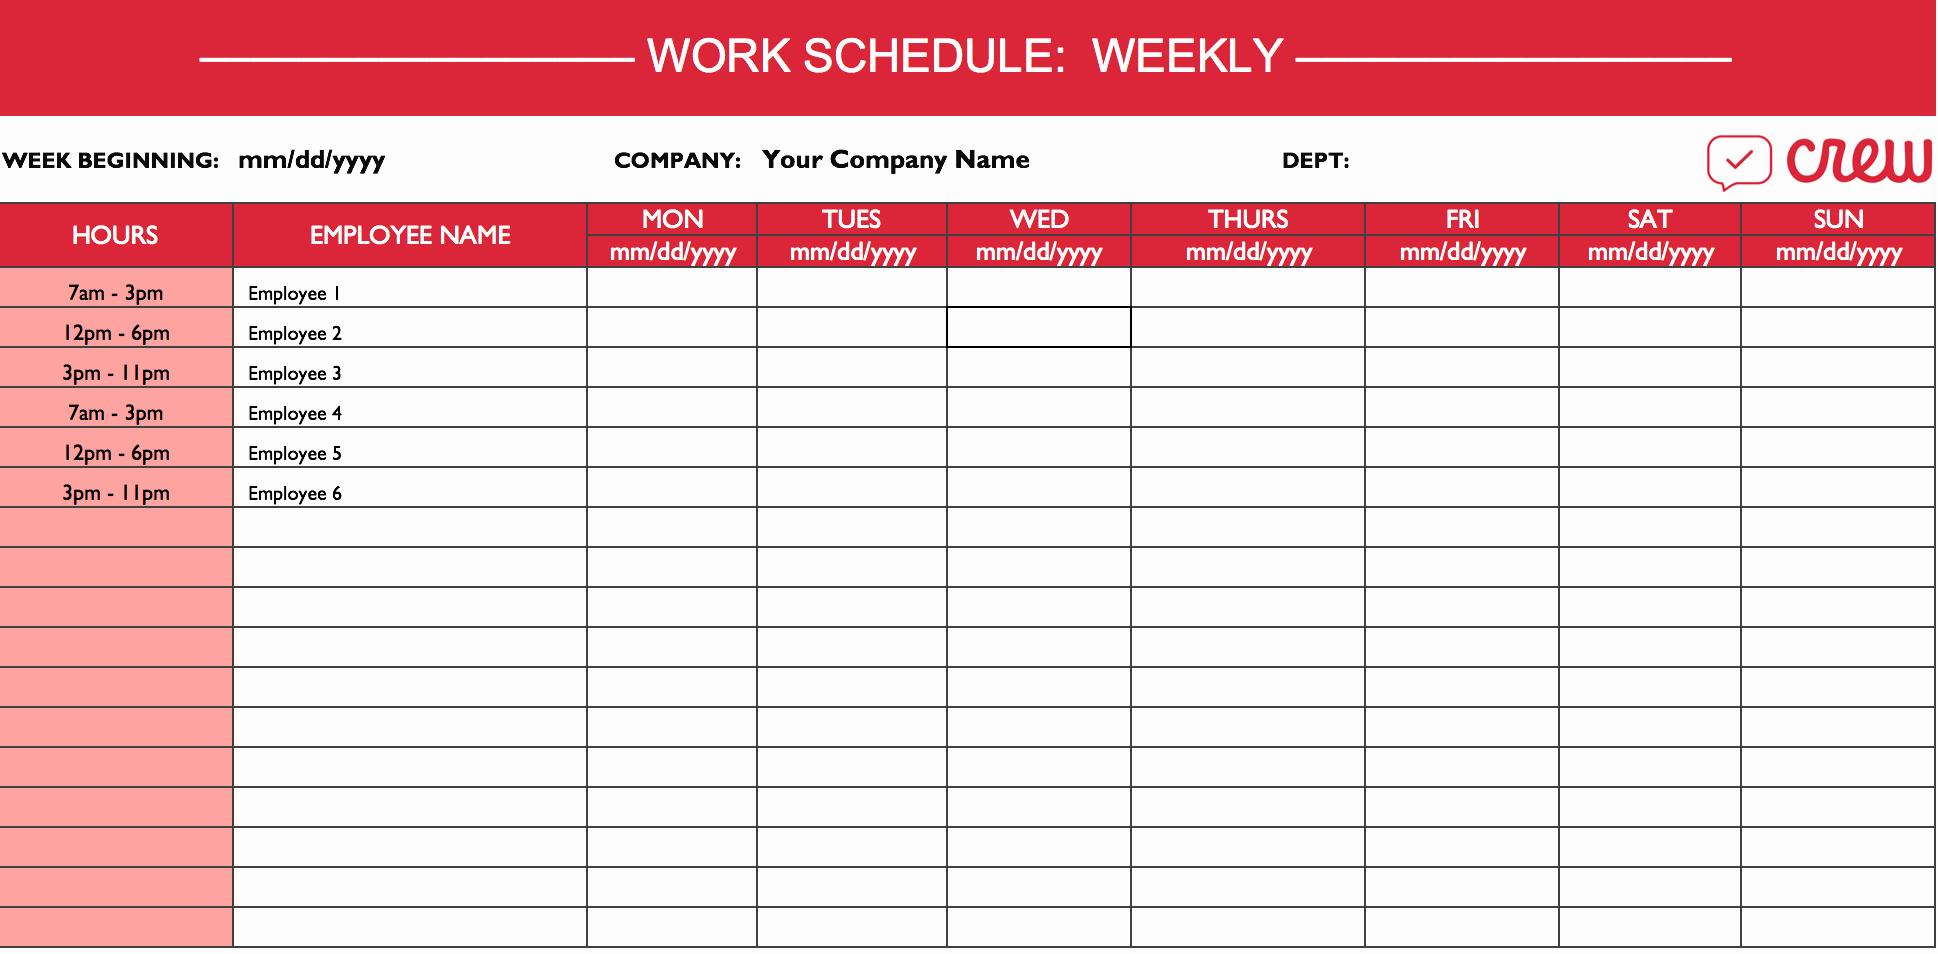 Work Schedule Template Free Best Of Weekly Work Schedule Template I Crew